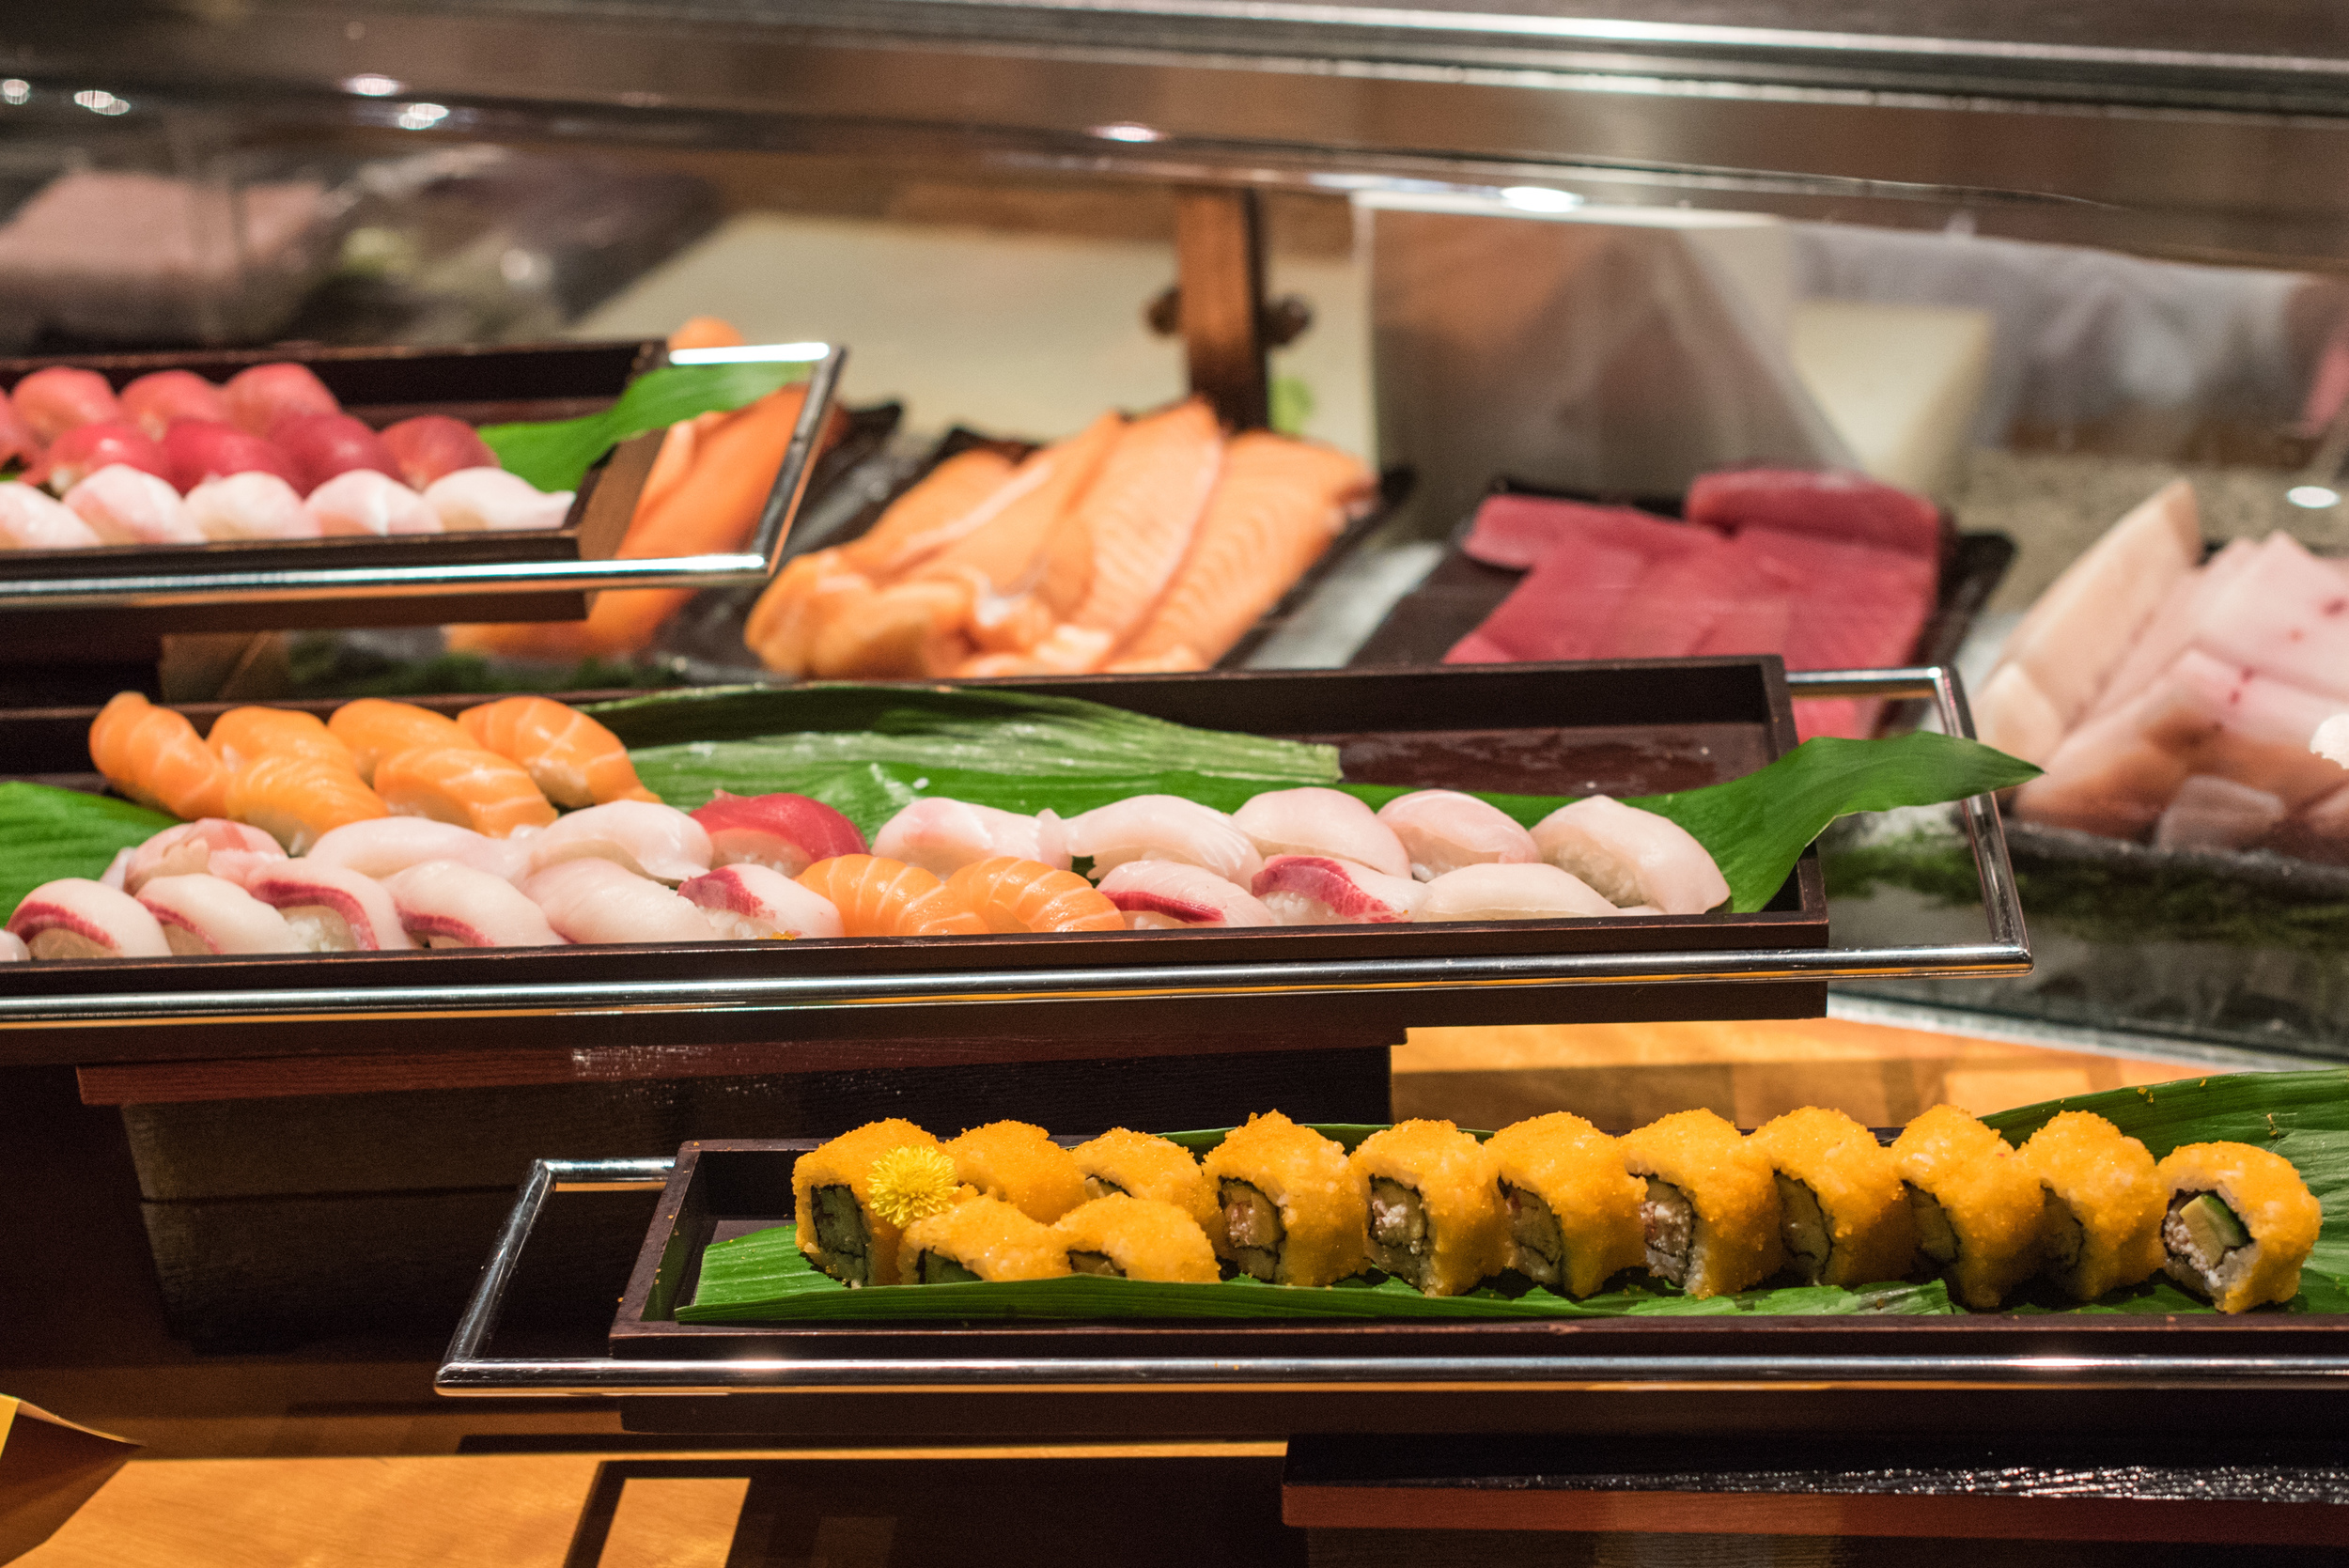 Sushi and Sashimi Bar  Mezza9 (Sunday Brunch) - Grand Hyatt Singapore